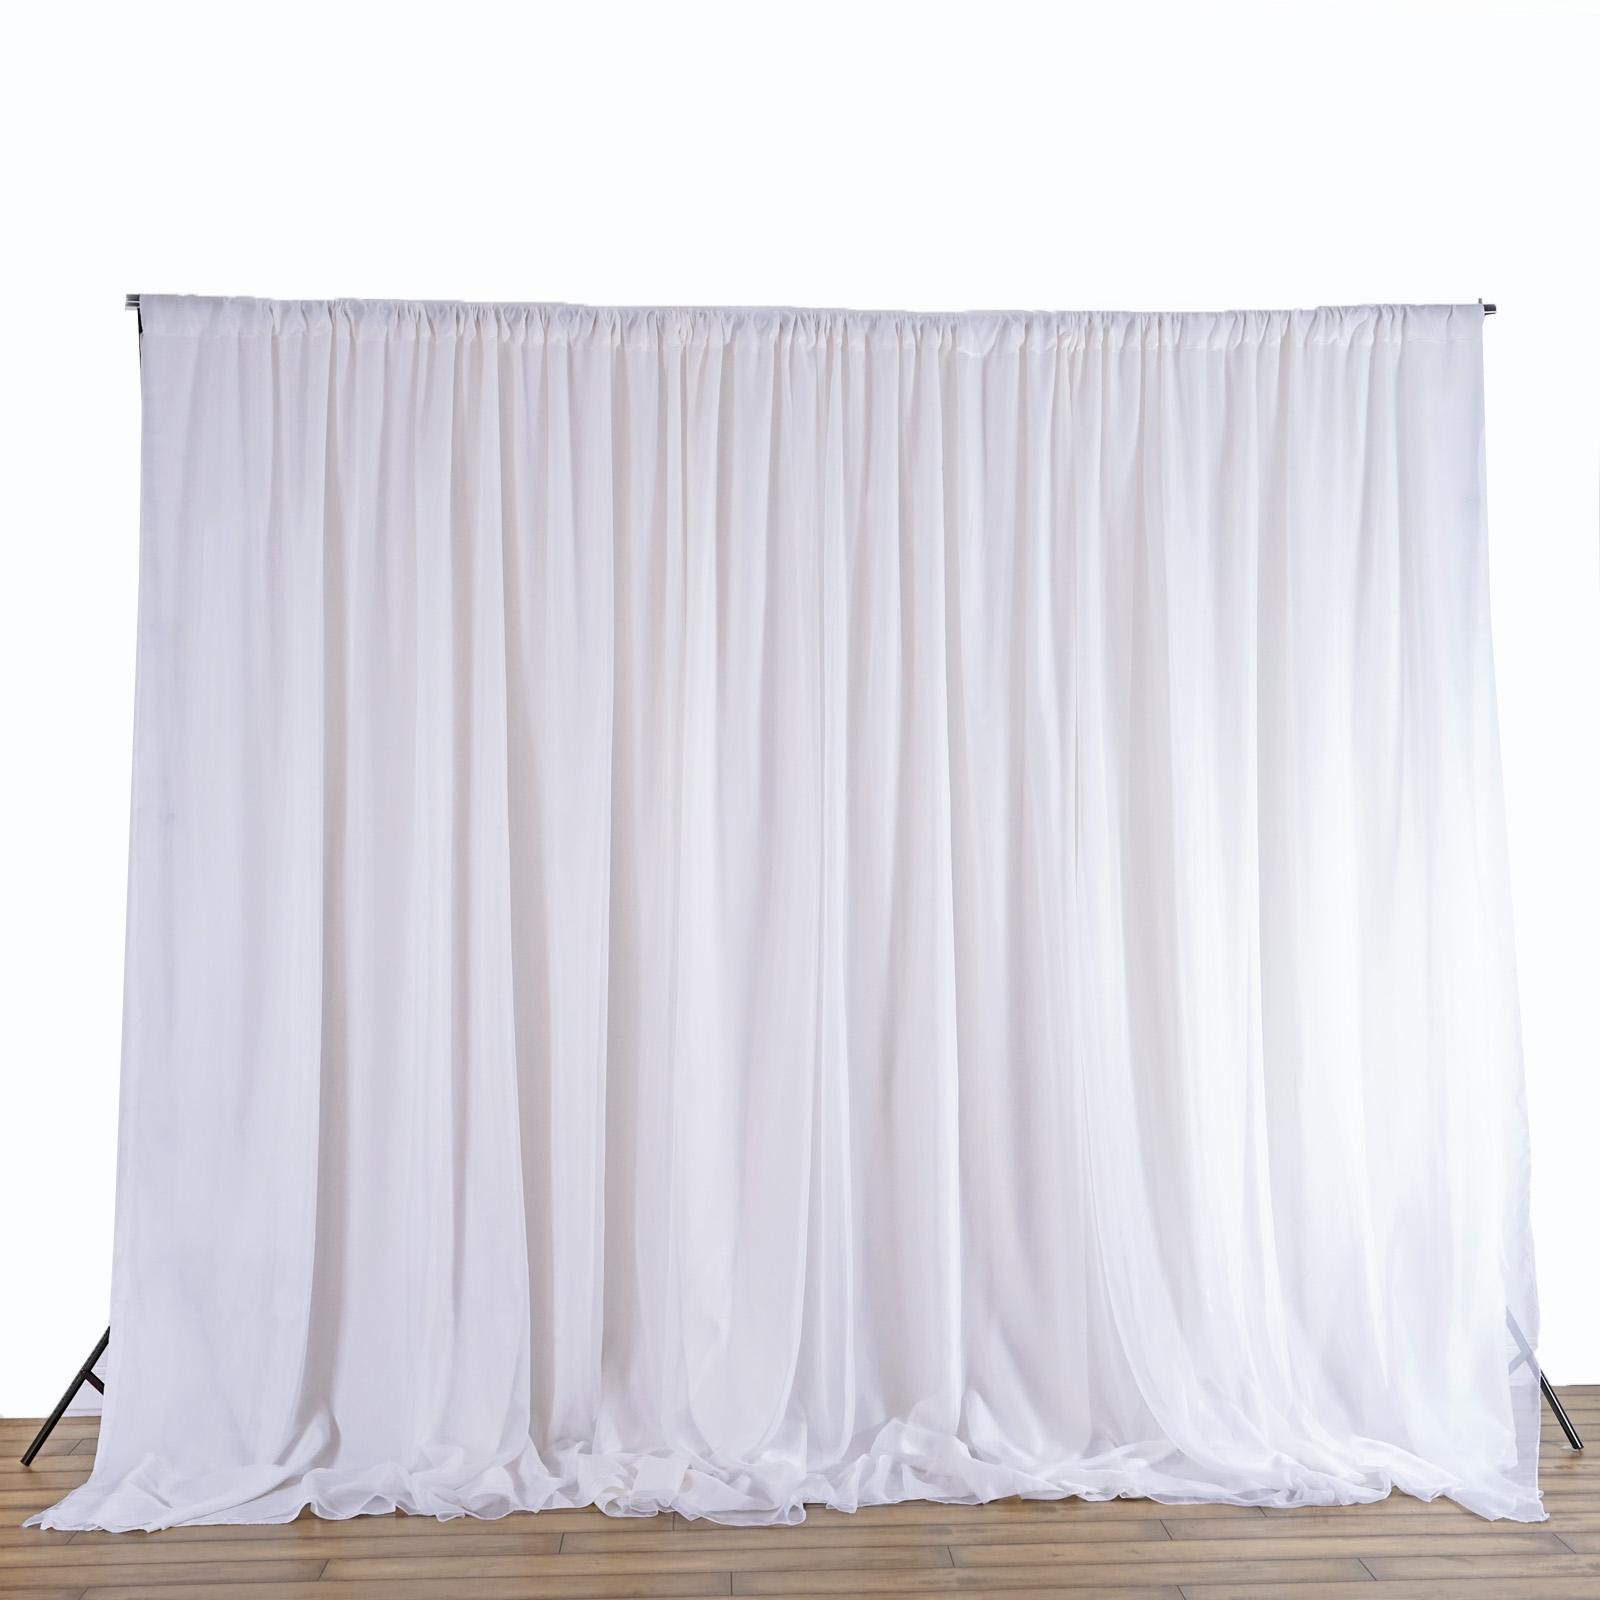 20 Ft X 8 Ft White Fabric Backdrop Wedding Altar Ceremony